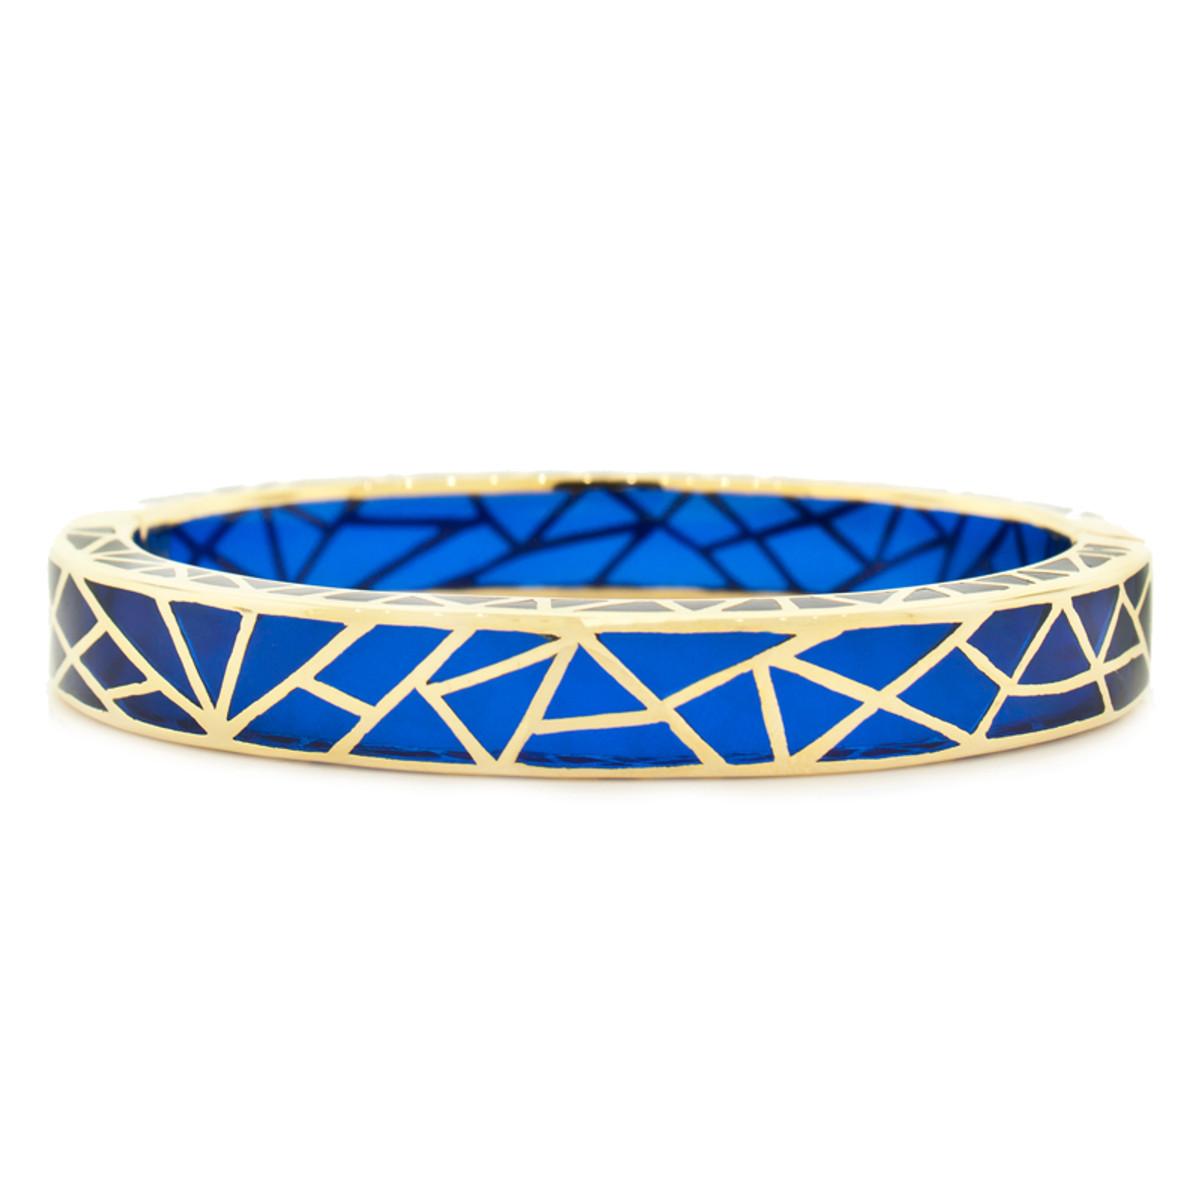 Andrew Hamilton Crawford Bracelet Kaleidoscope Sapphire and Gold